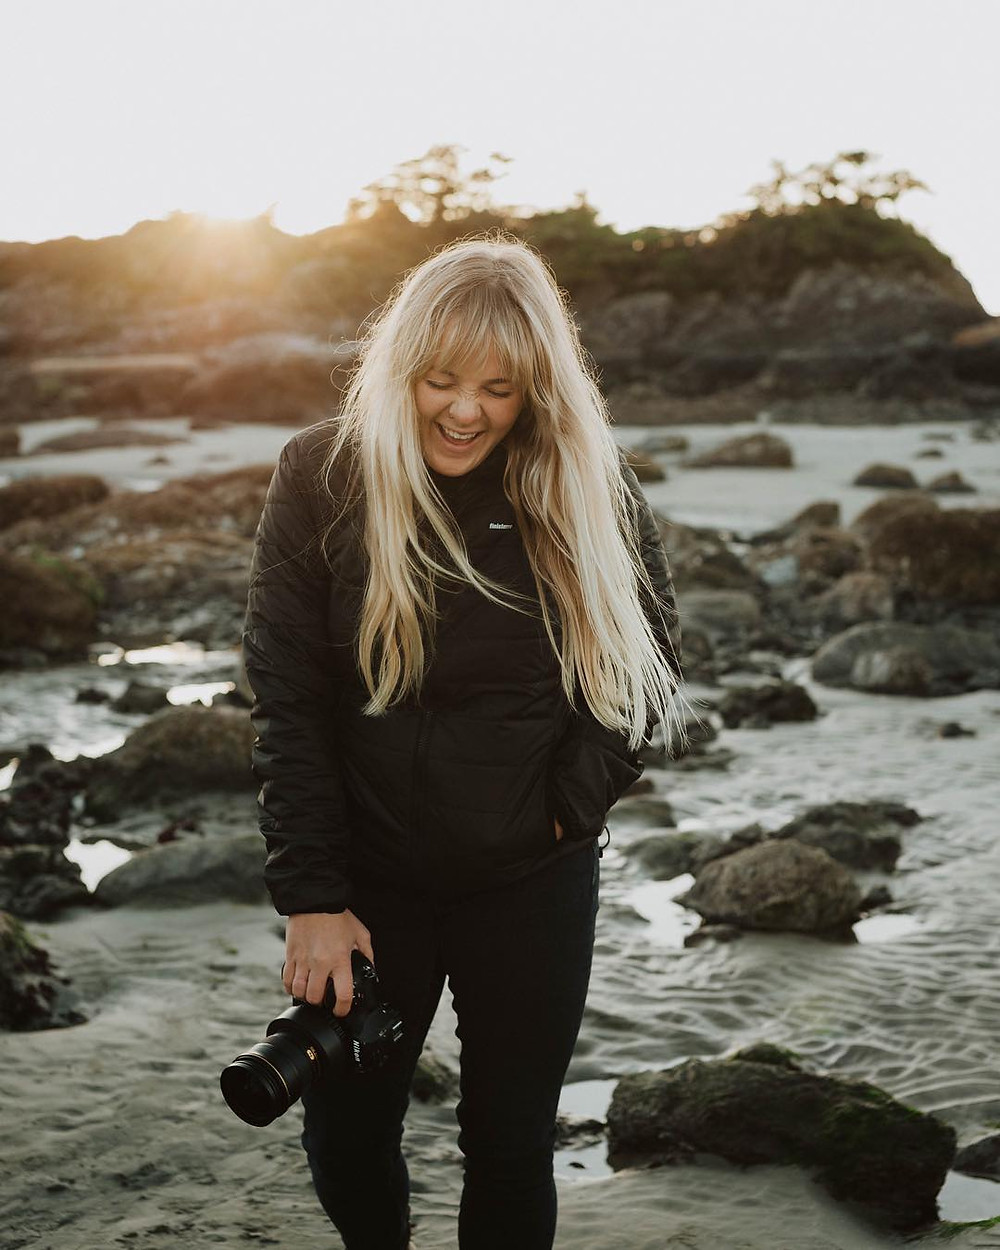 Bryanna Bradley, fotojornalista e fotógrafa de surf canadense